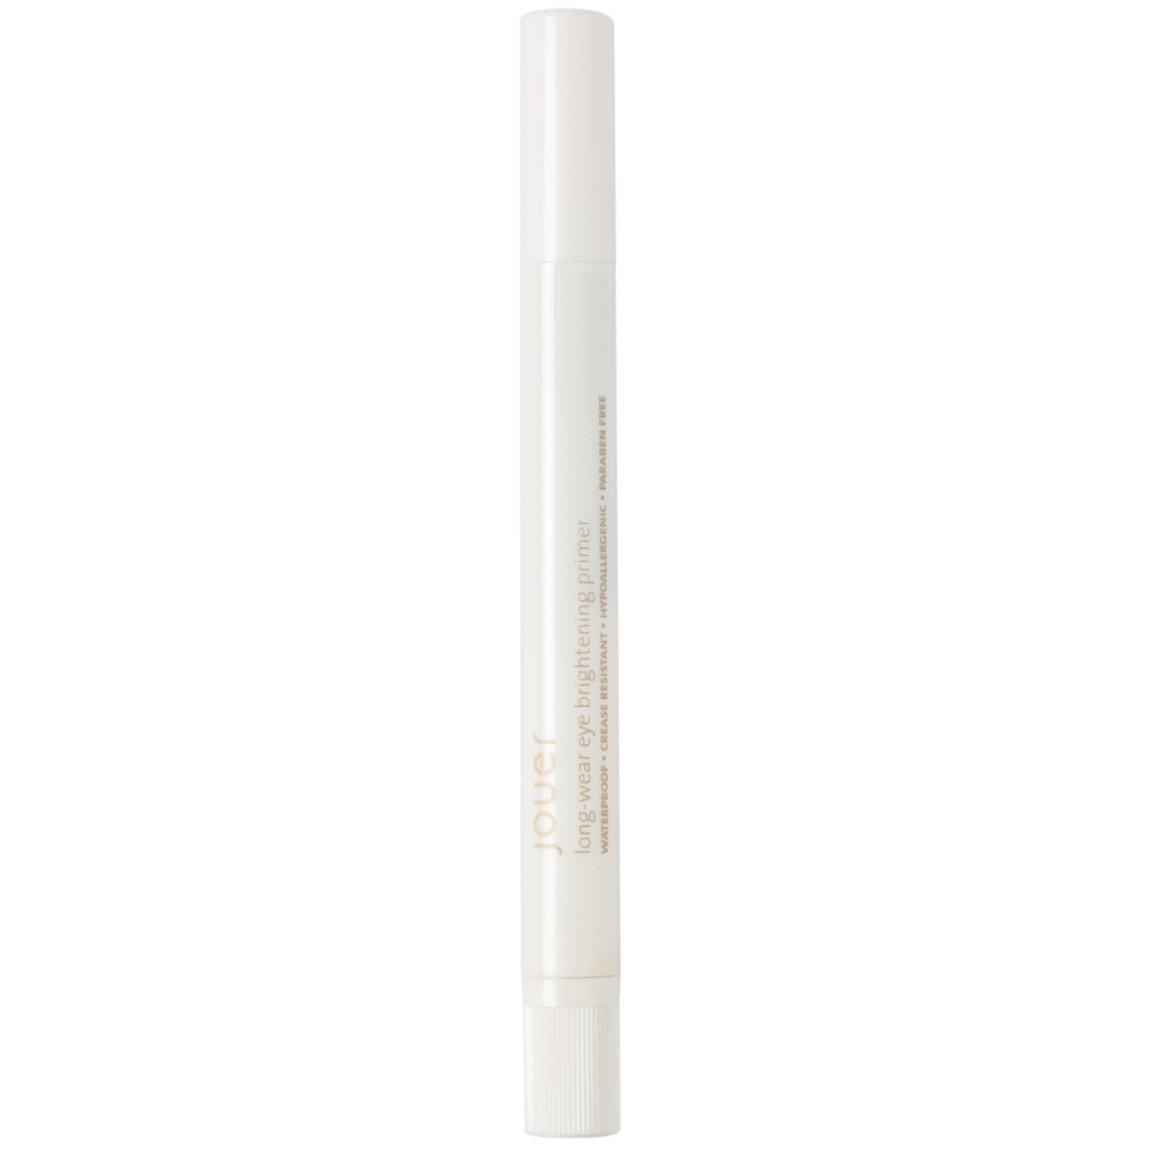 Jouer Cosmetics Long-Wear Eye Brightening Primer product swatch.